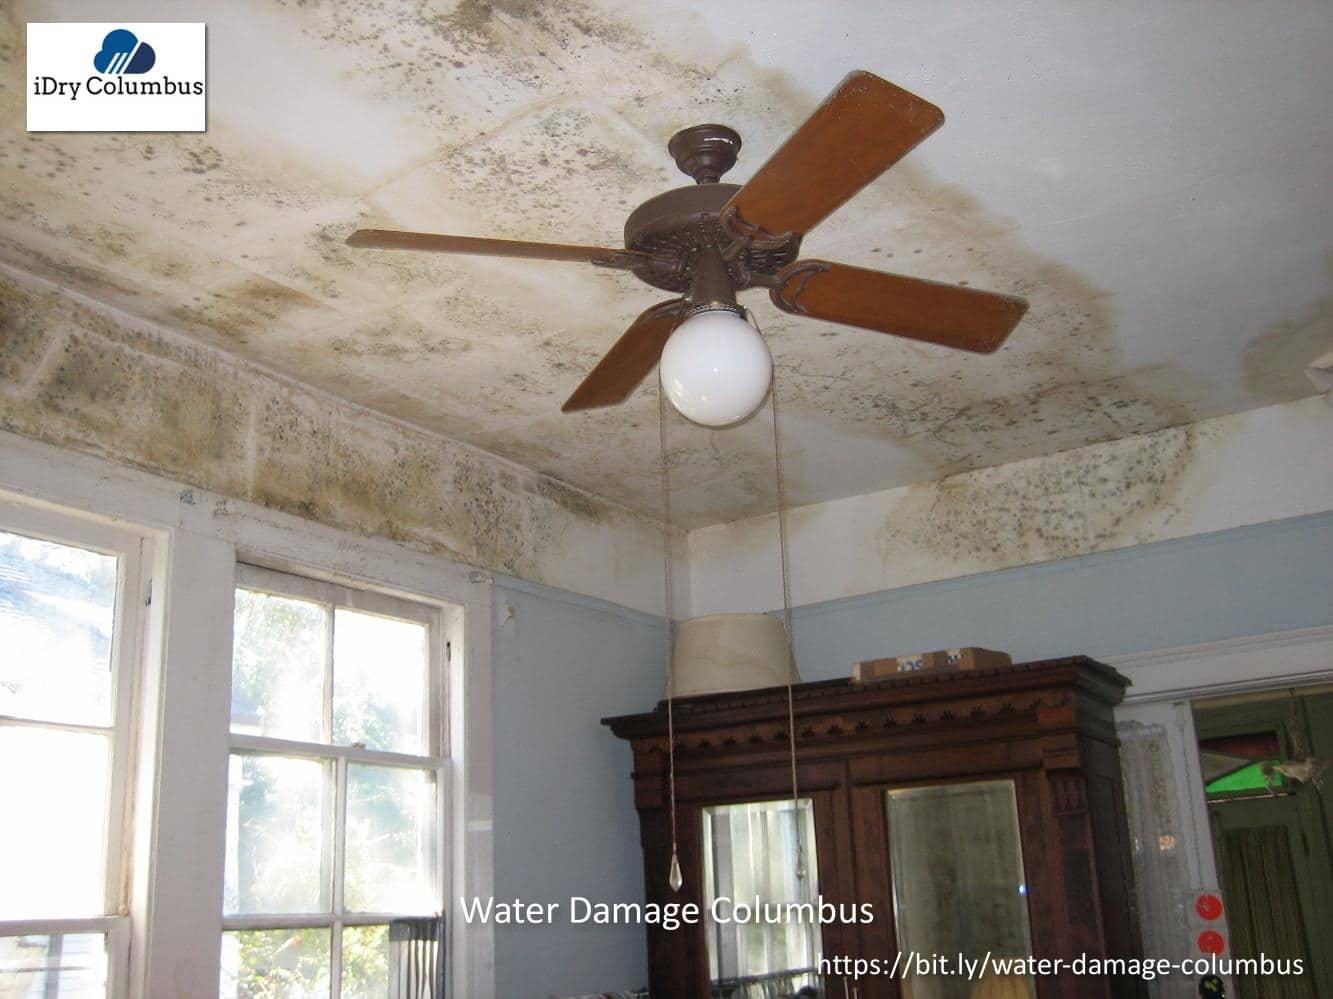 Idry Columbus Water Damage Cleanup (m1) (cid) 6